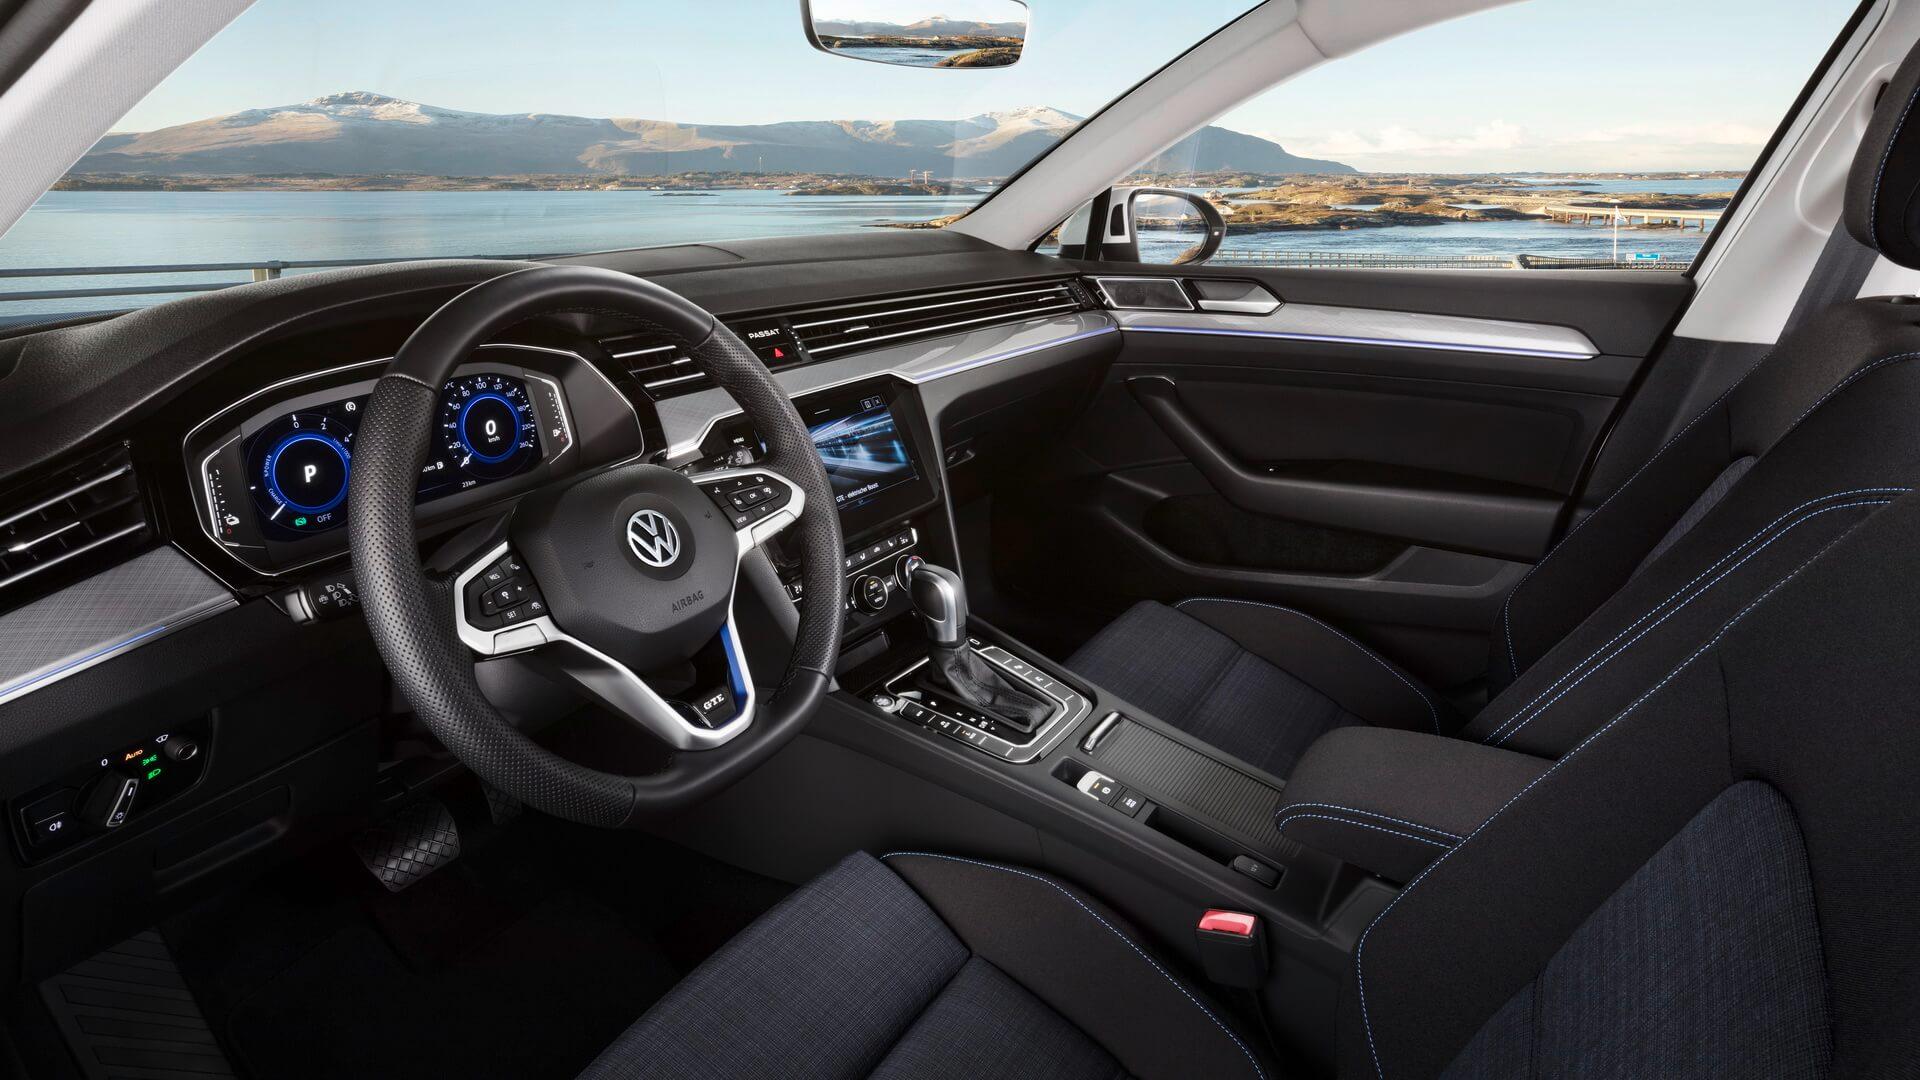 Интерьер Volkswagen Passat GTE 2019 - фото 3